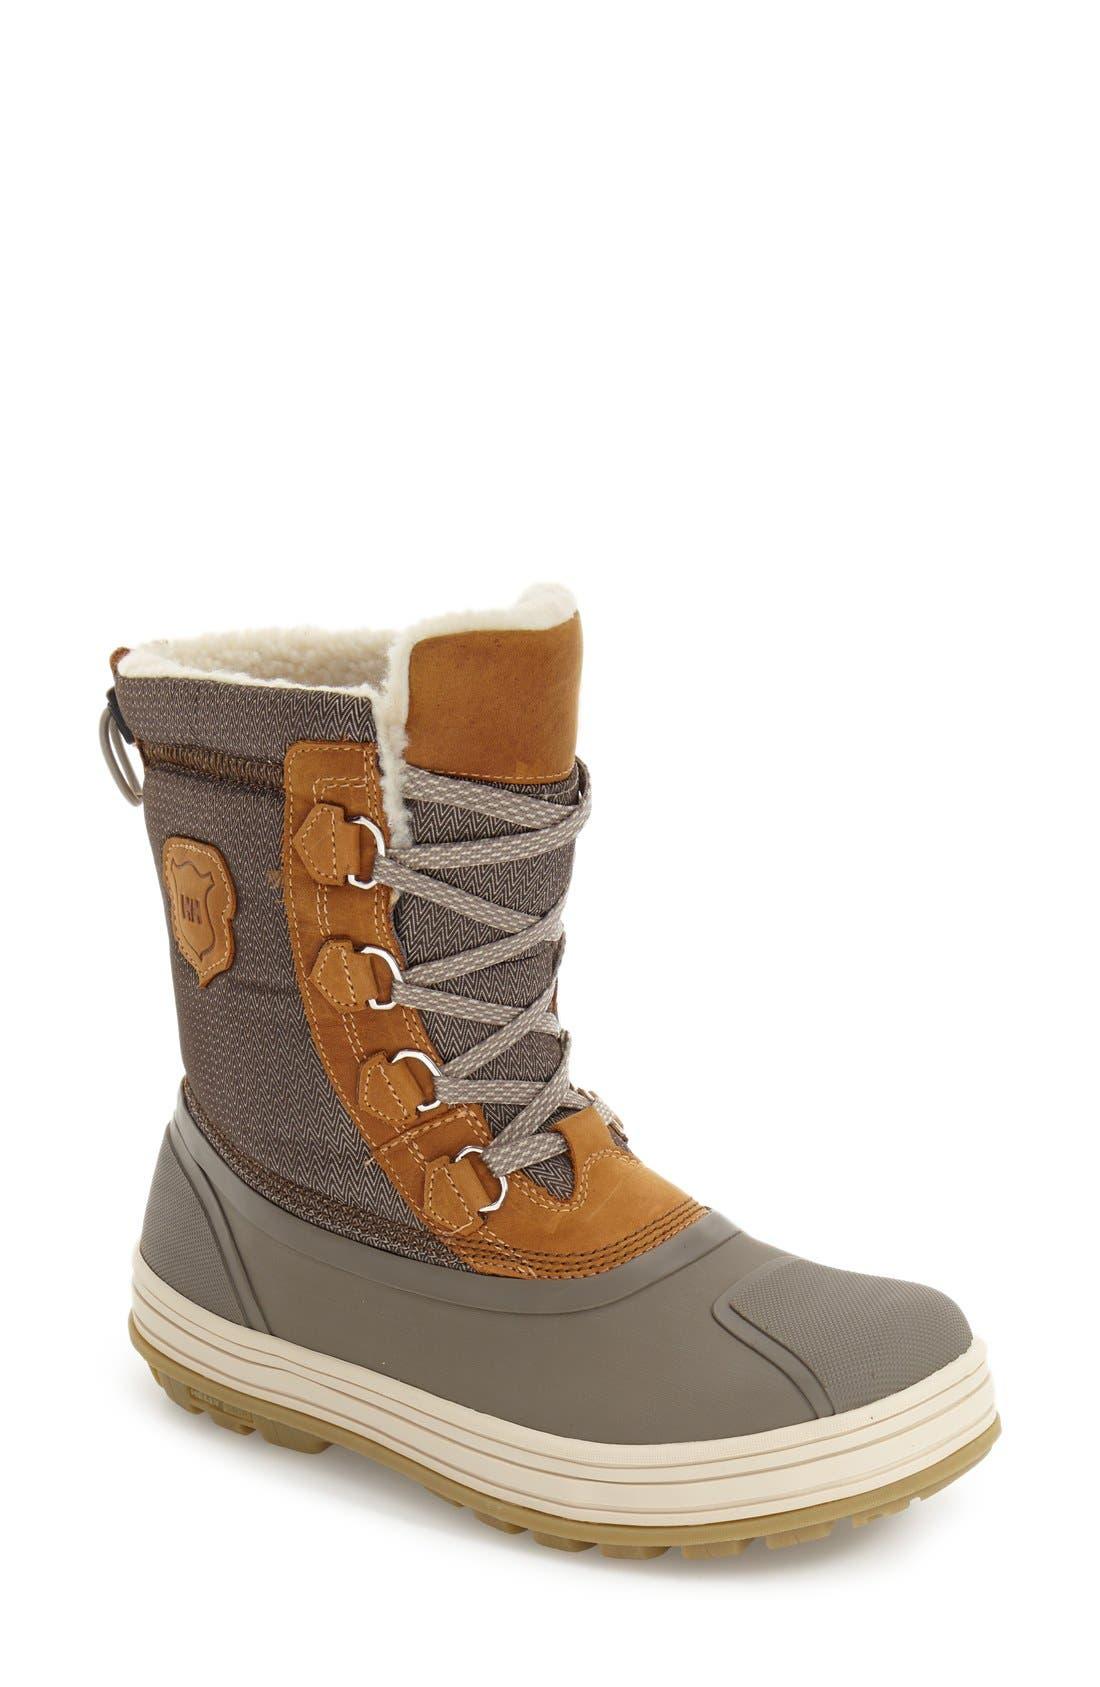 HELLY HANSEN Framheim Winter Boot